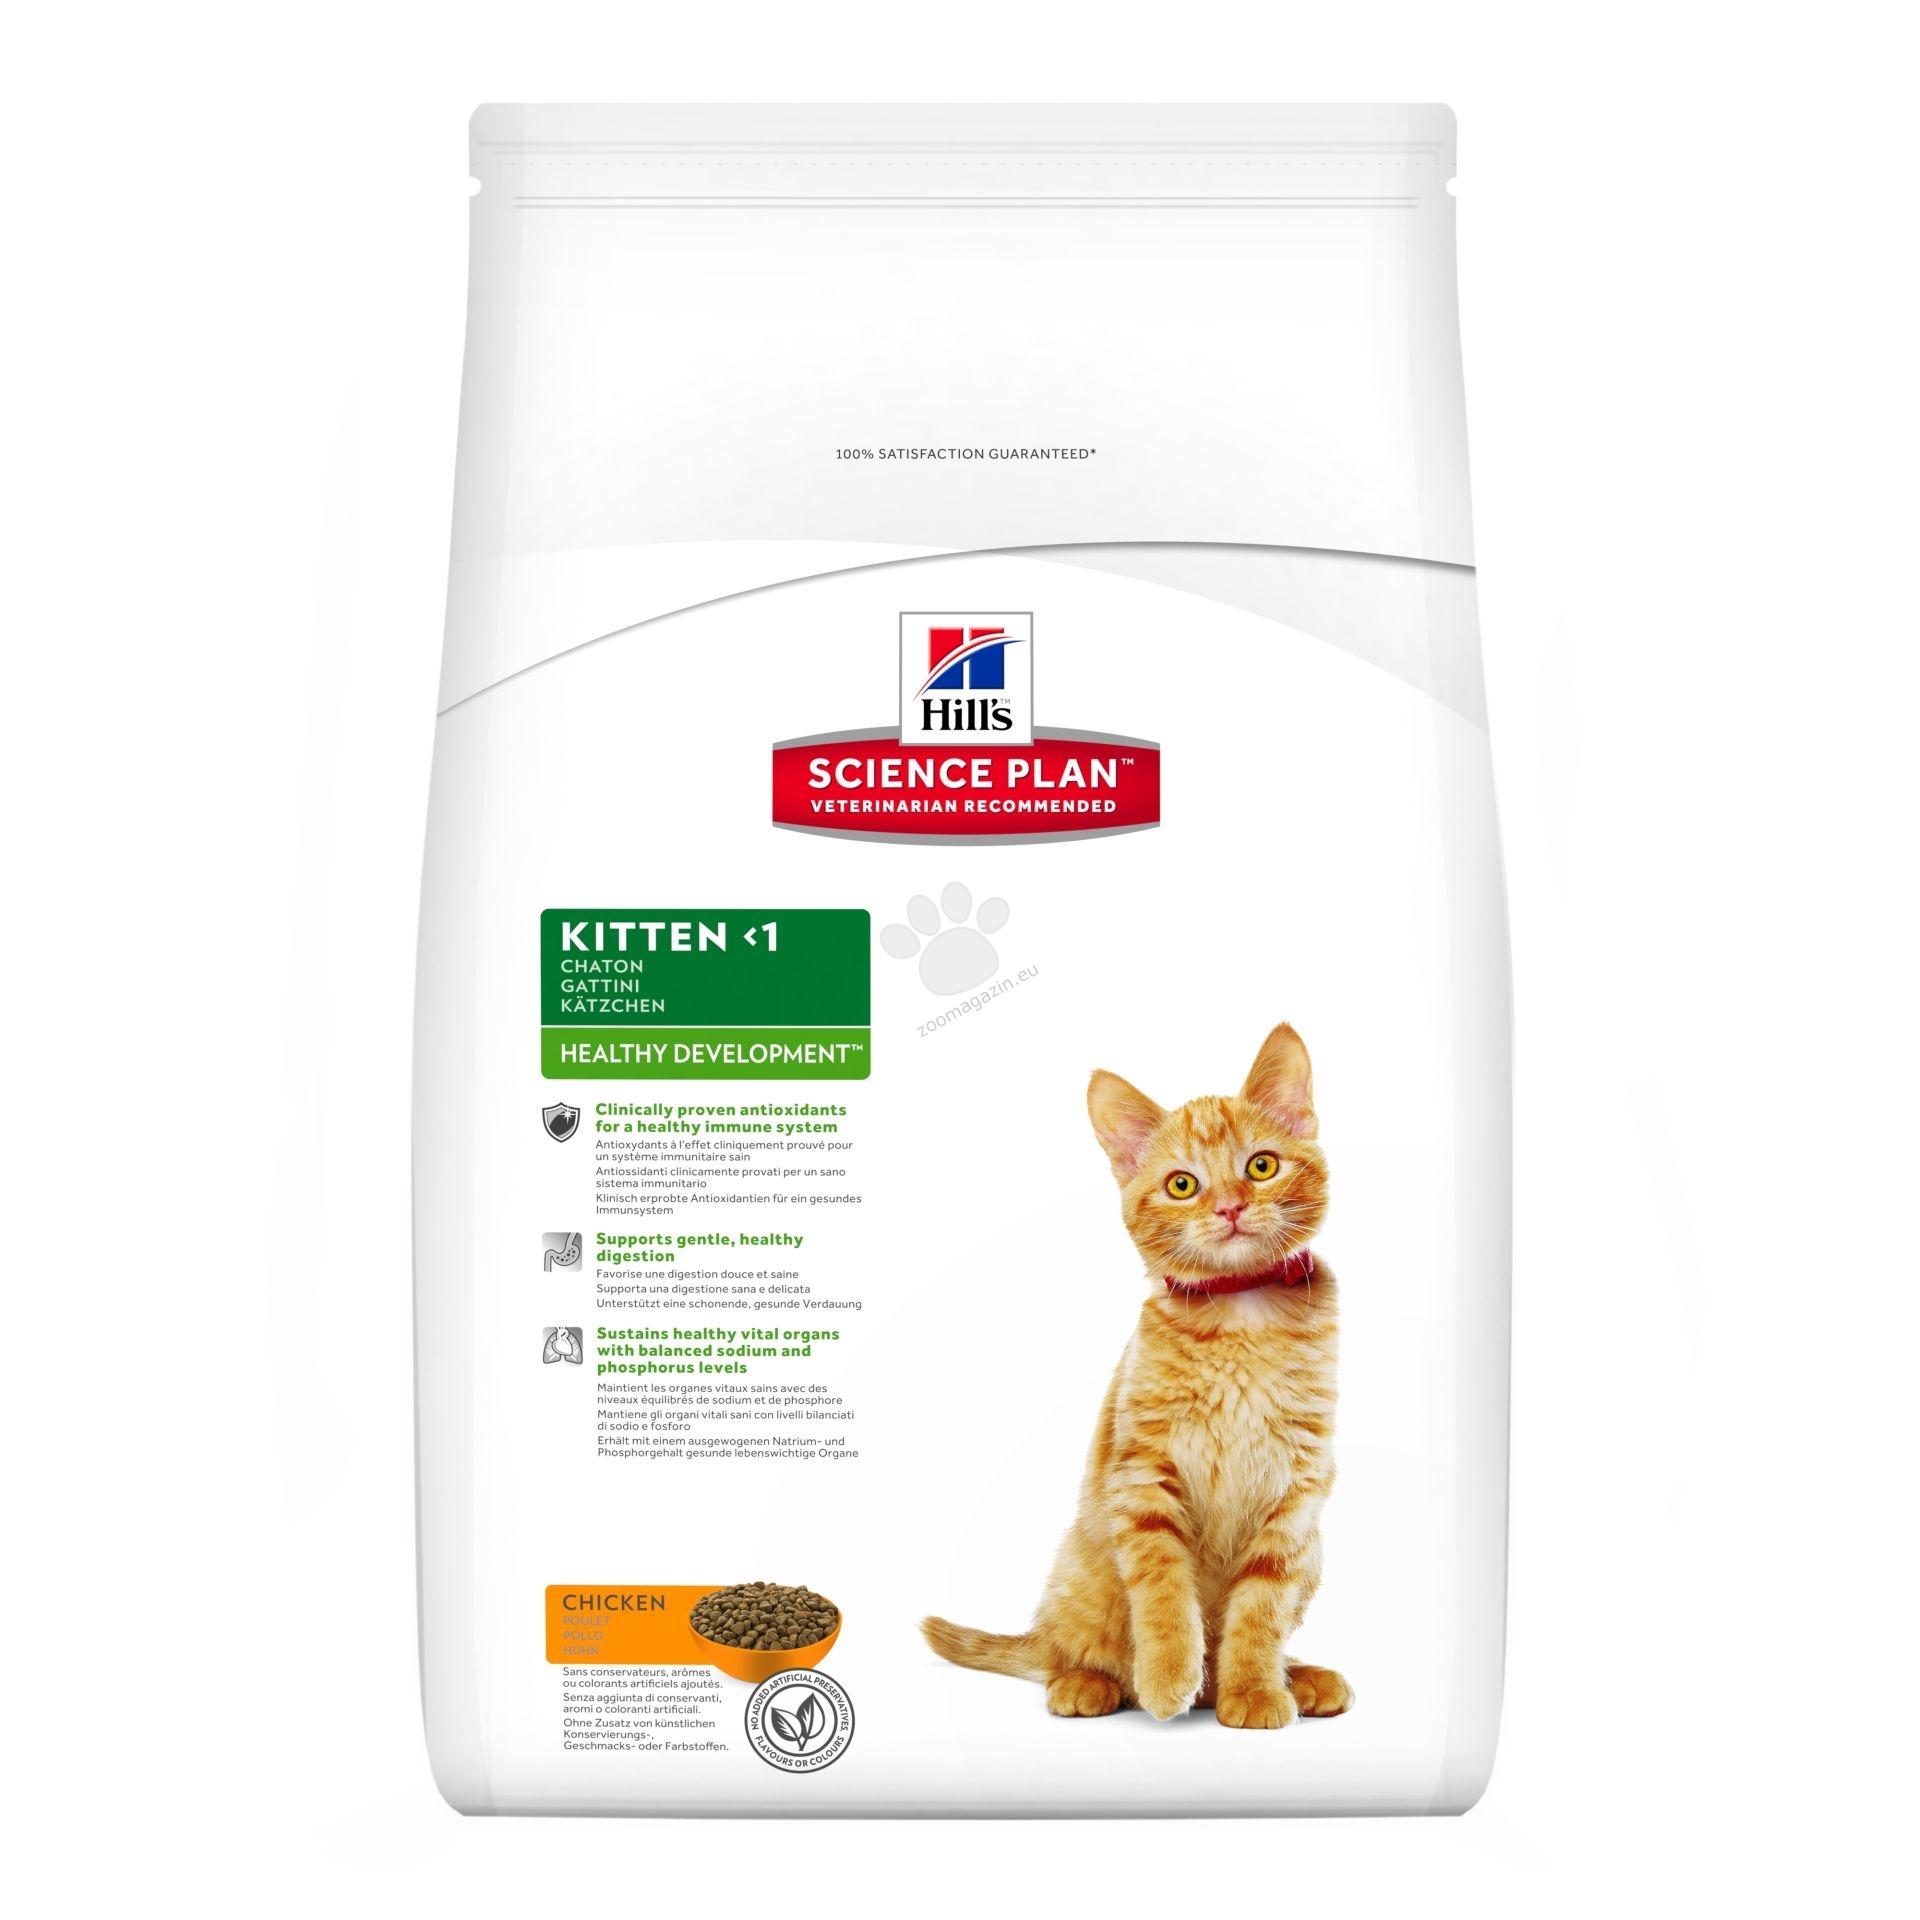 SciencePlan Kitten Healthy Development Chicken - с пилешко месо - Котенца от отбиването до 1 година, котки по време на бременност и кърмене 10 кг. + ПОДАРЪК: 3 кутии x 12 пауча Kitten FAVOURITE SELECTION